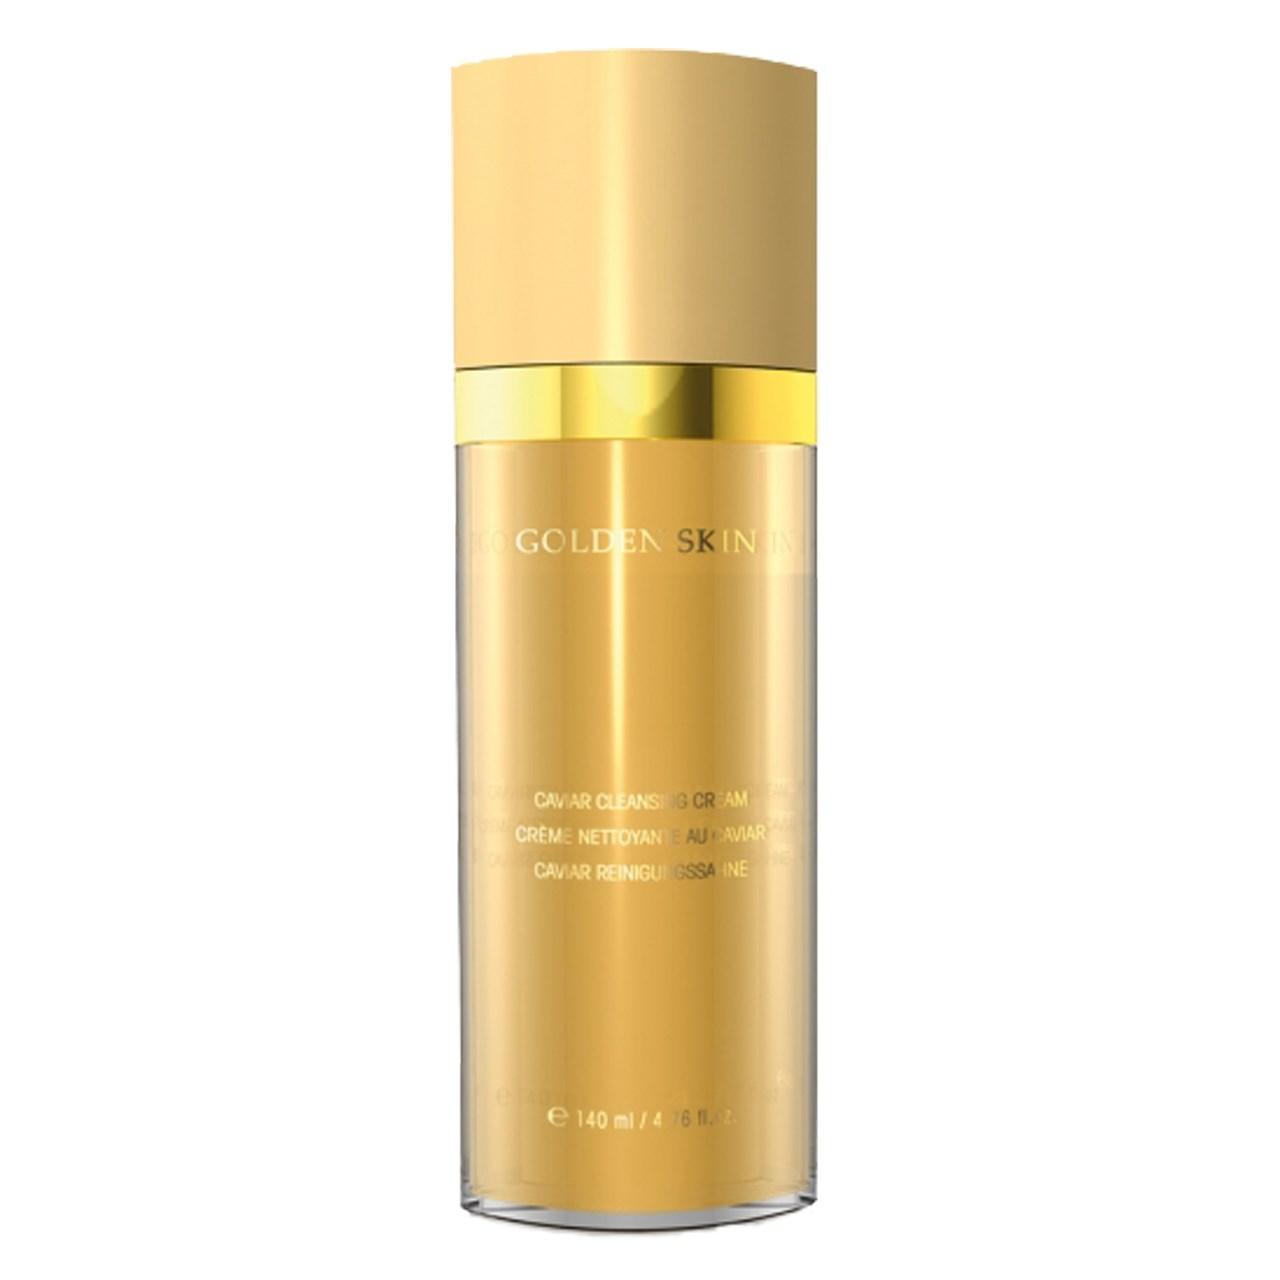 کرم پاک کننده صورت اتق بل سری Golden Skin کد 3290 حجم140 میلی لیتر